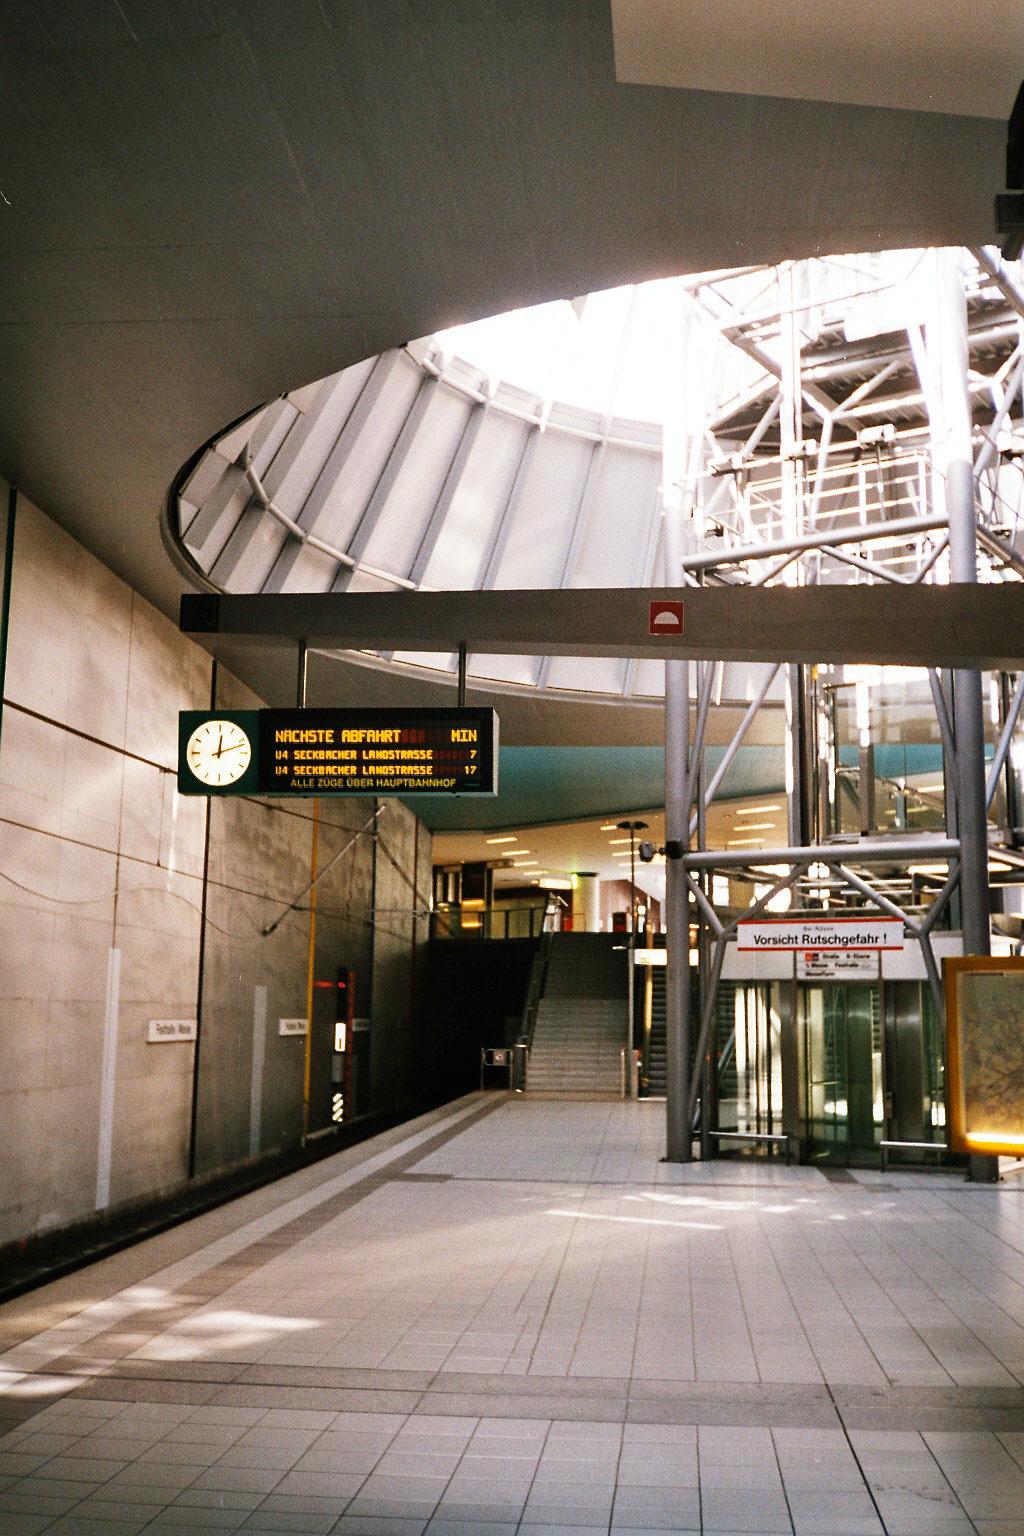 File:Frankfurt U-Bahn Festhalle Messe 2.jpg - Wikimedia Commons